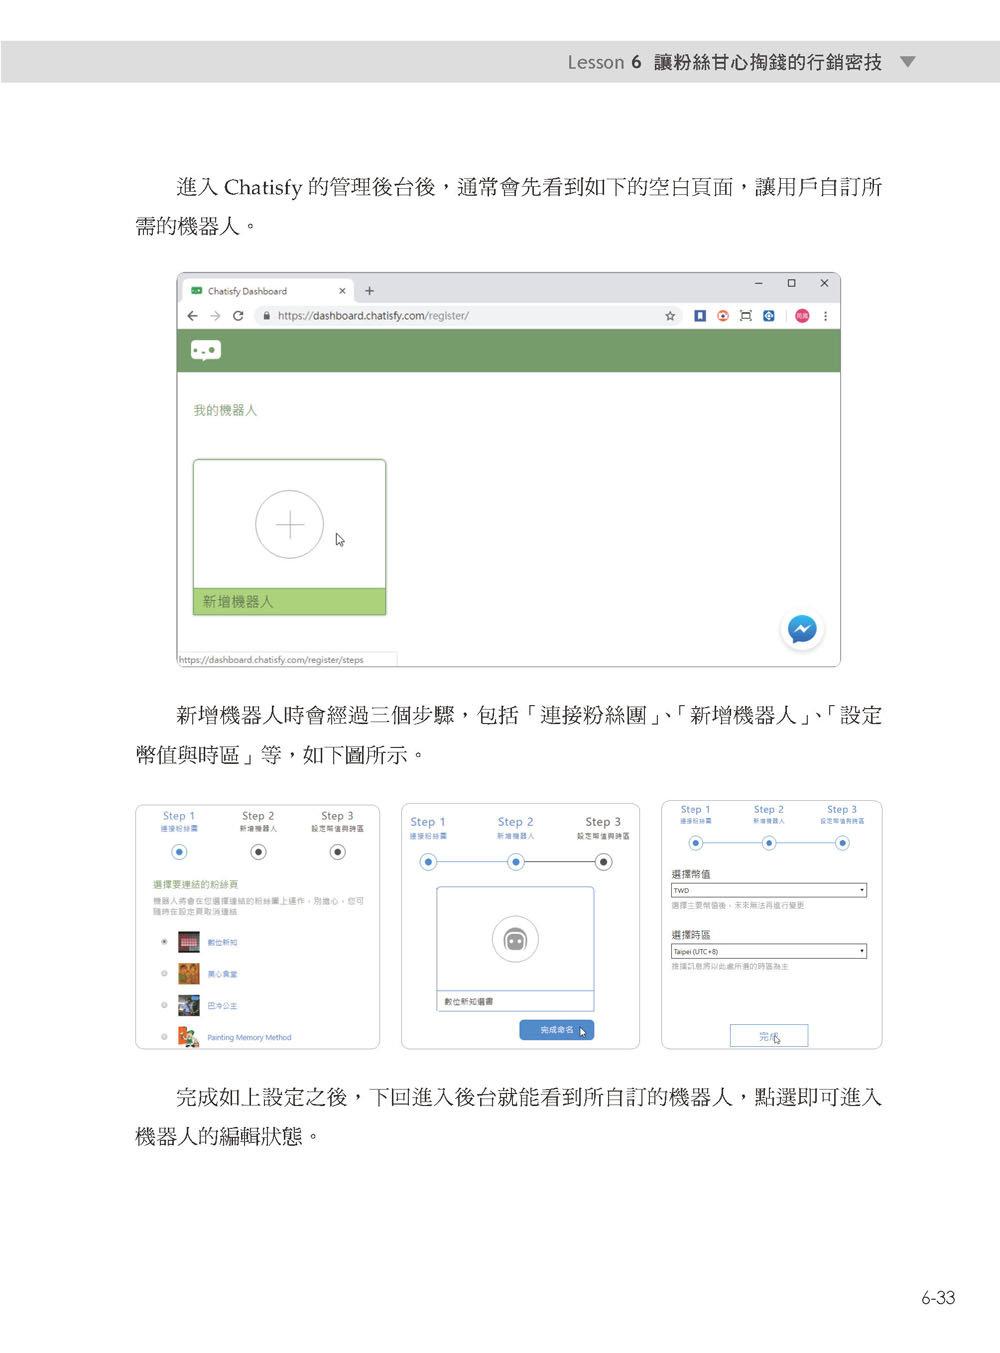 Facebook 互動行銷:社群口碑經營新思路+廣告投放如何有成效,想做好臉書行銷,操作心法就在這!-preview-21